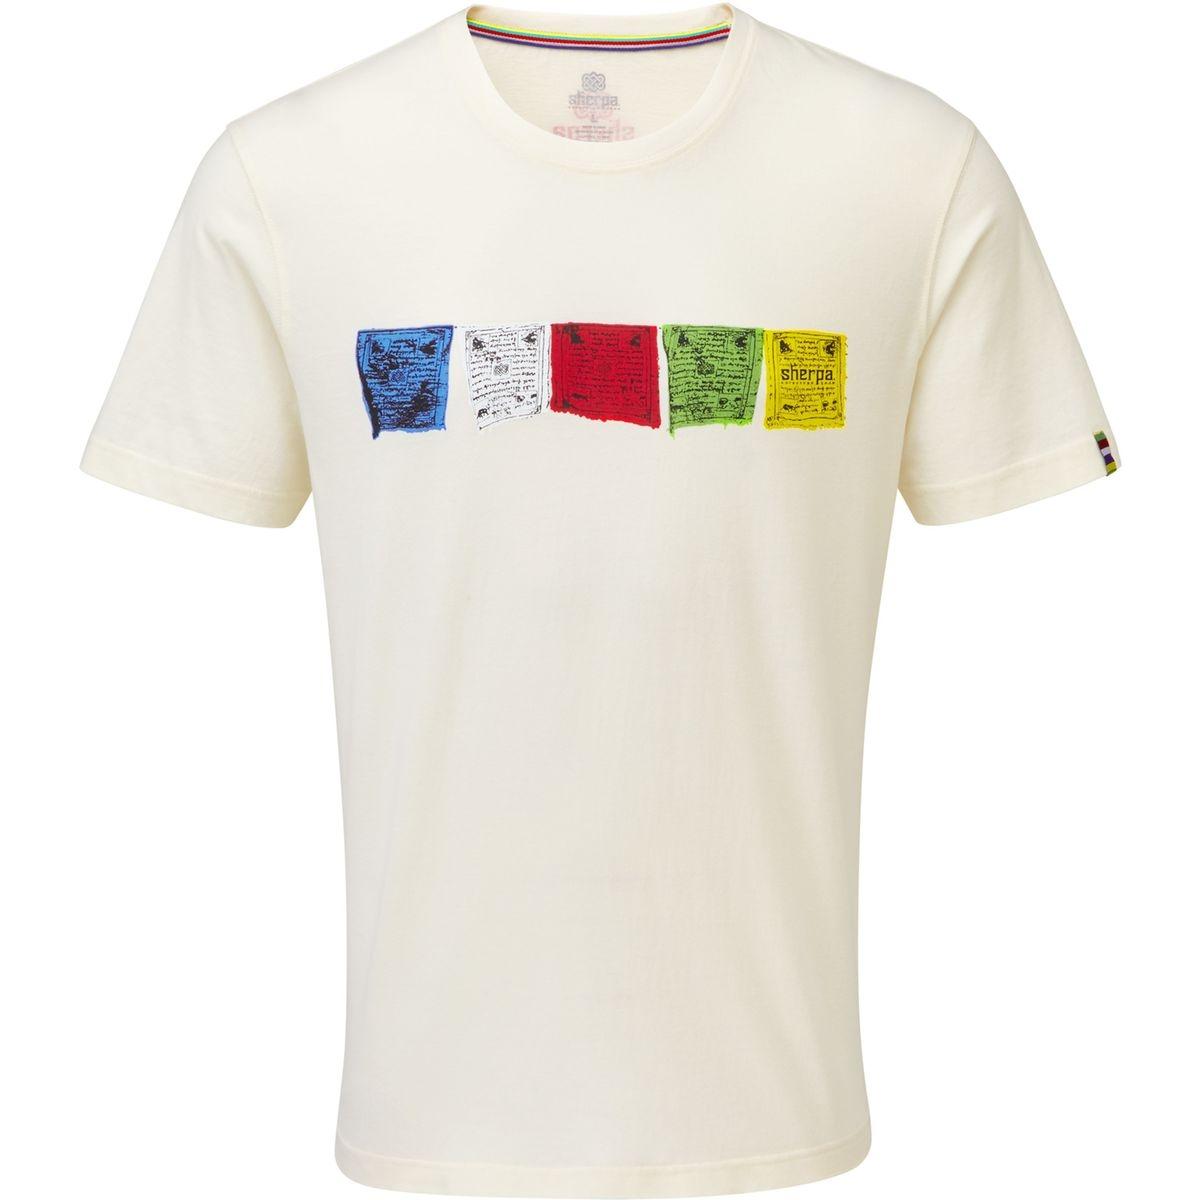 Tarcho - T-shirt manches courtes Homme - blanc